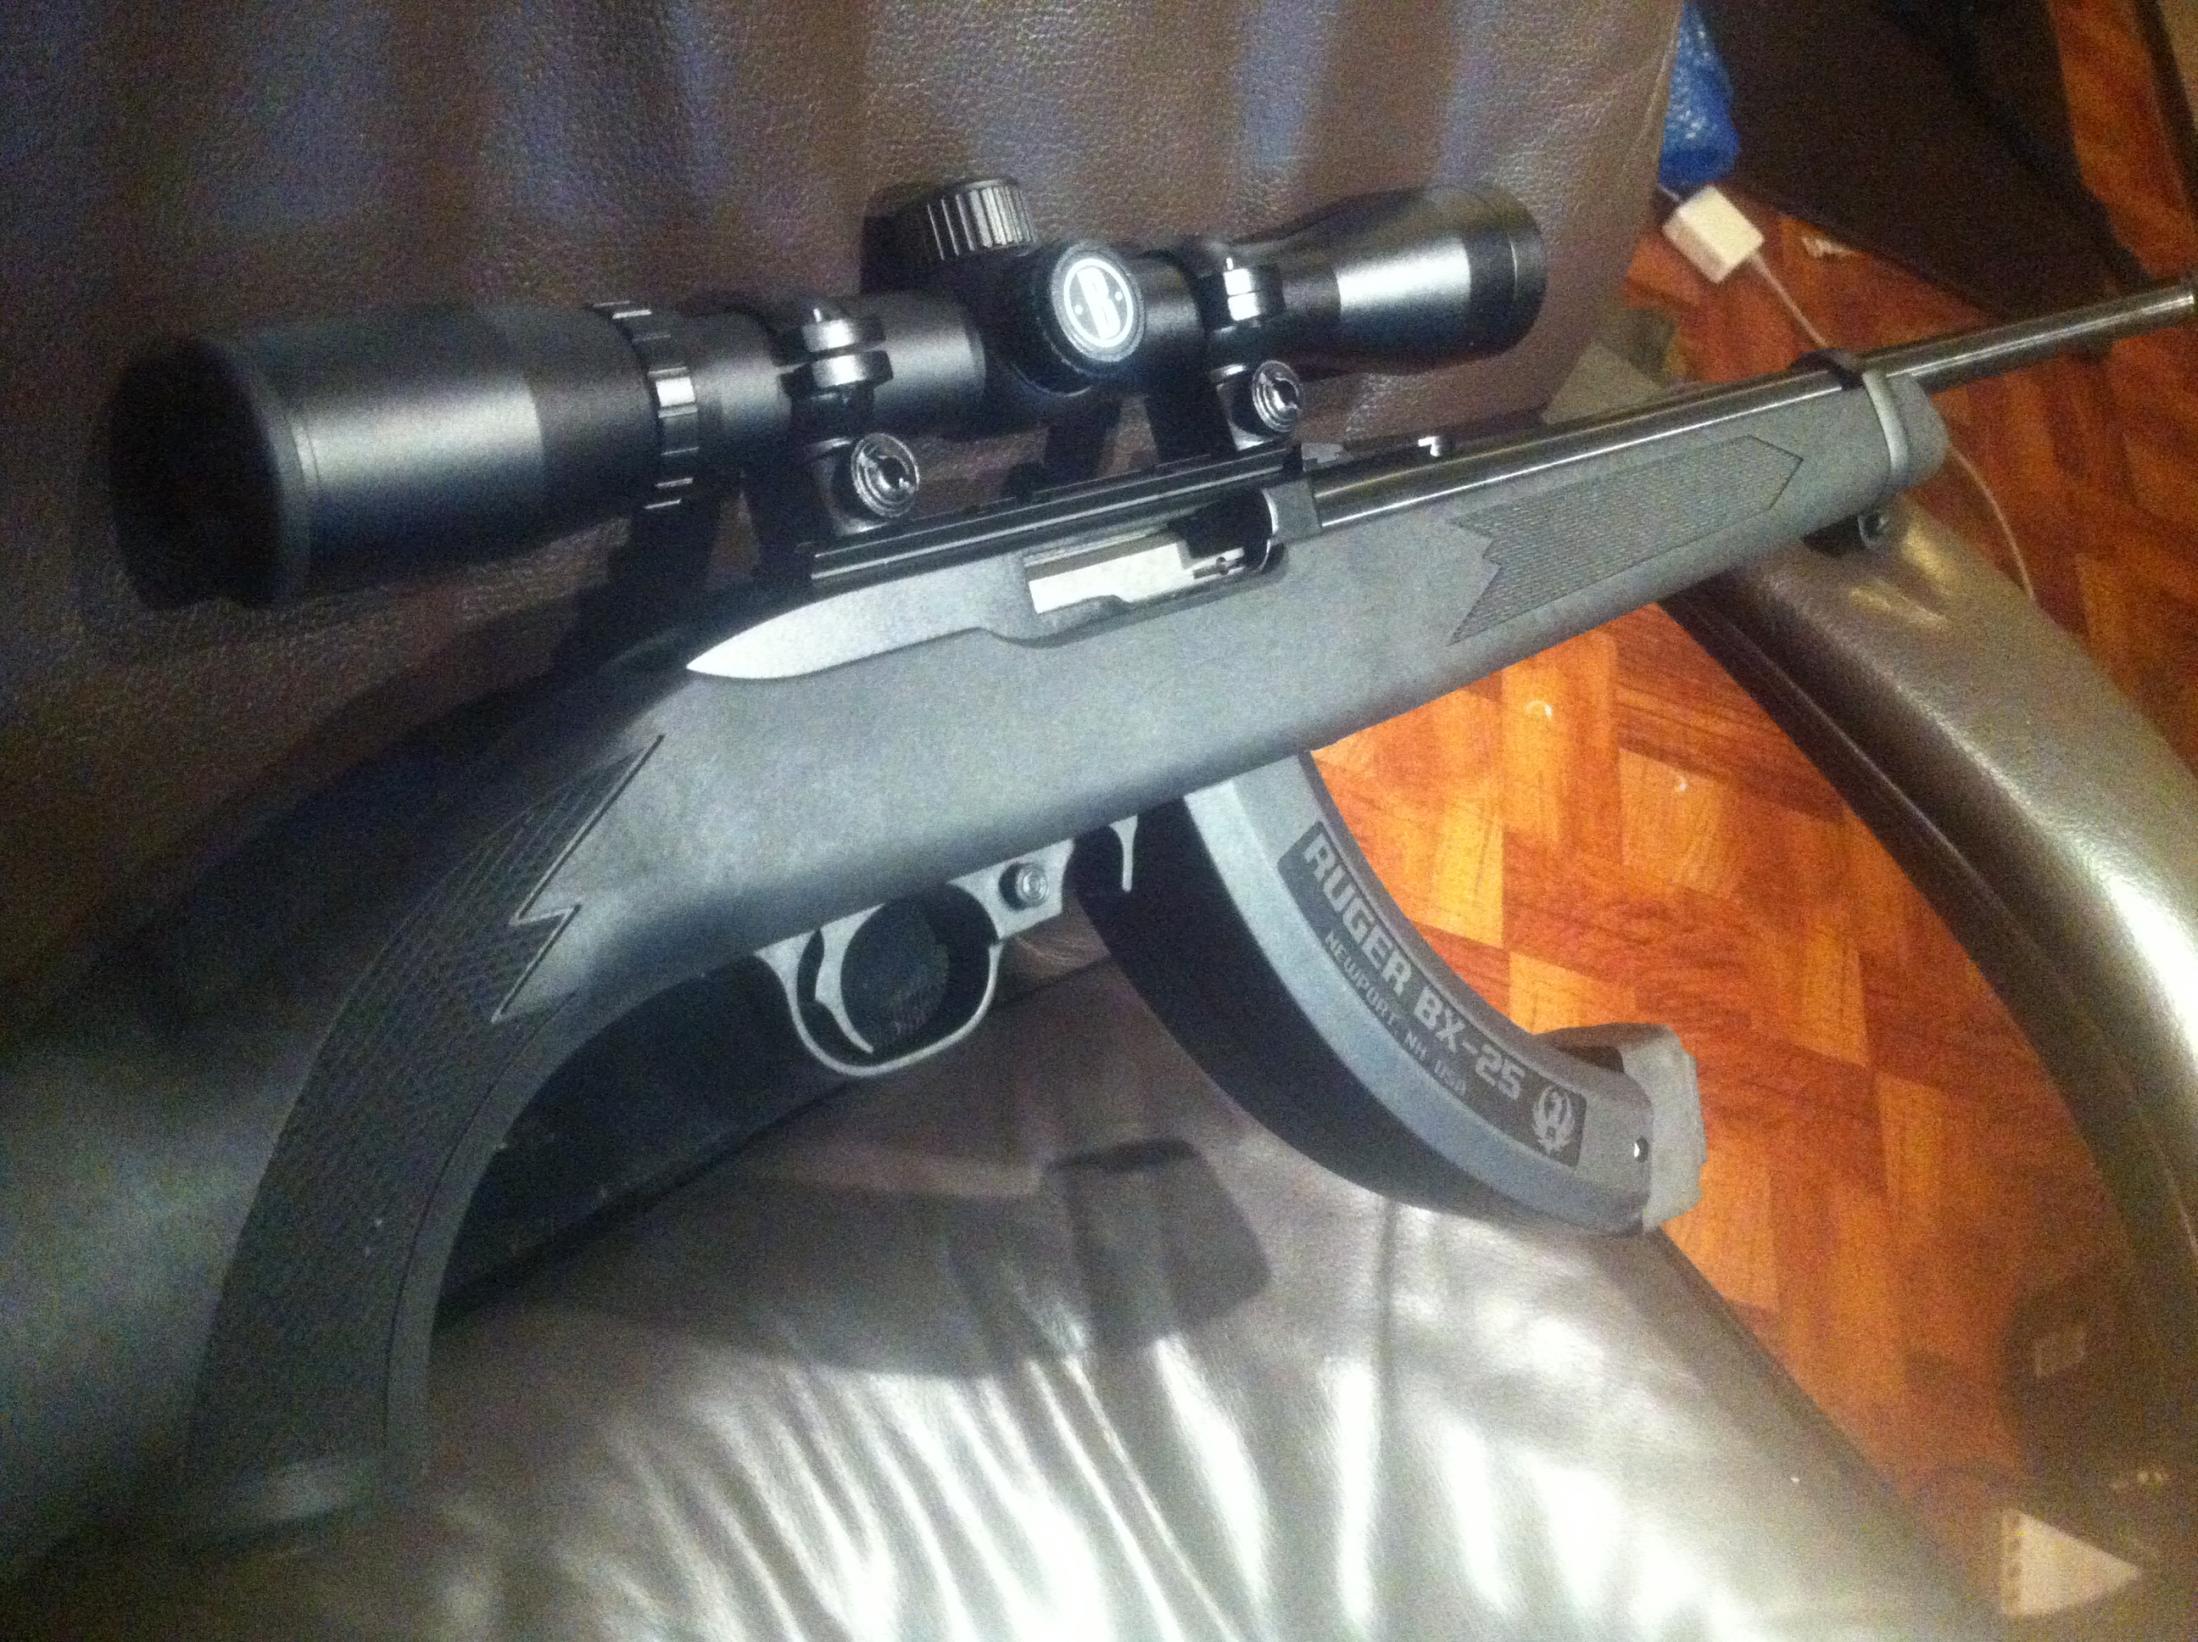 Show us your first gun-img_0998.jpg